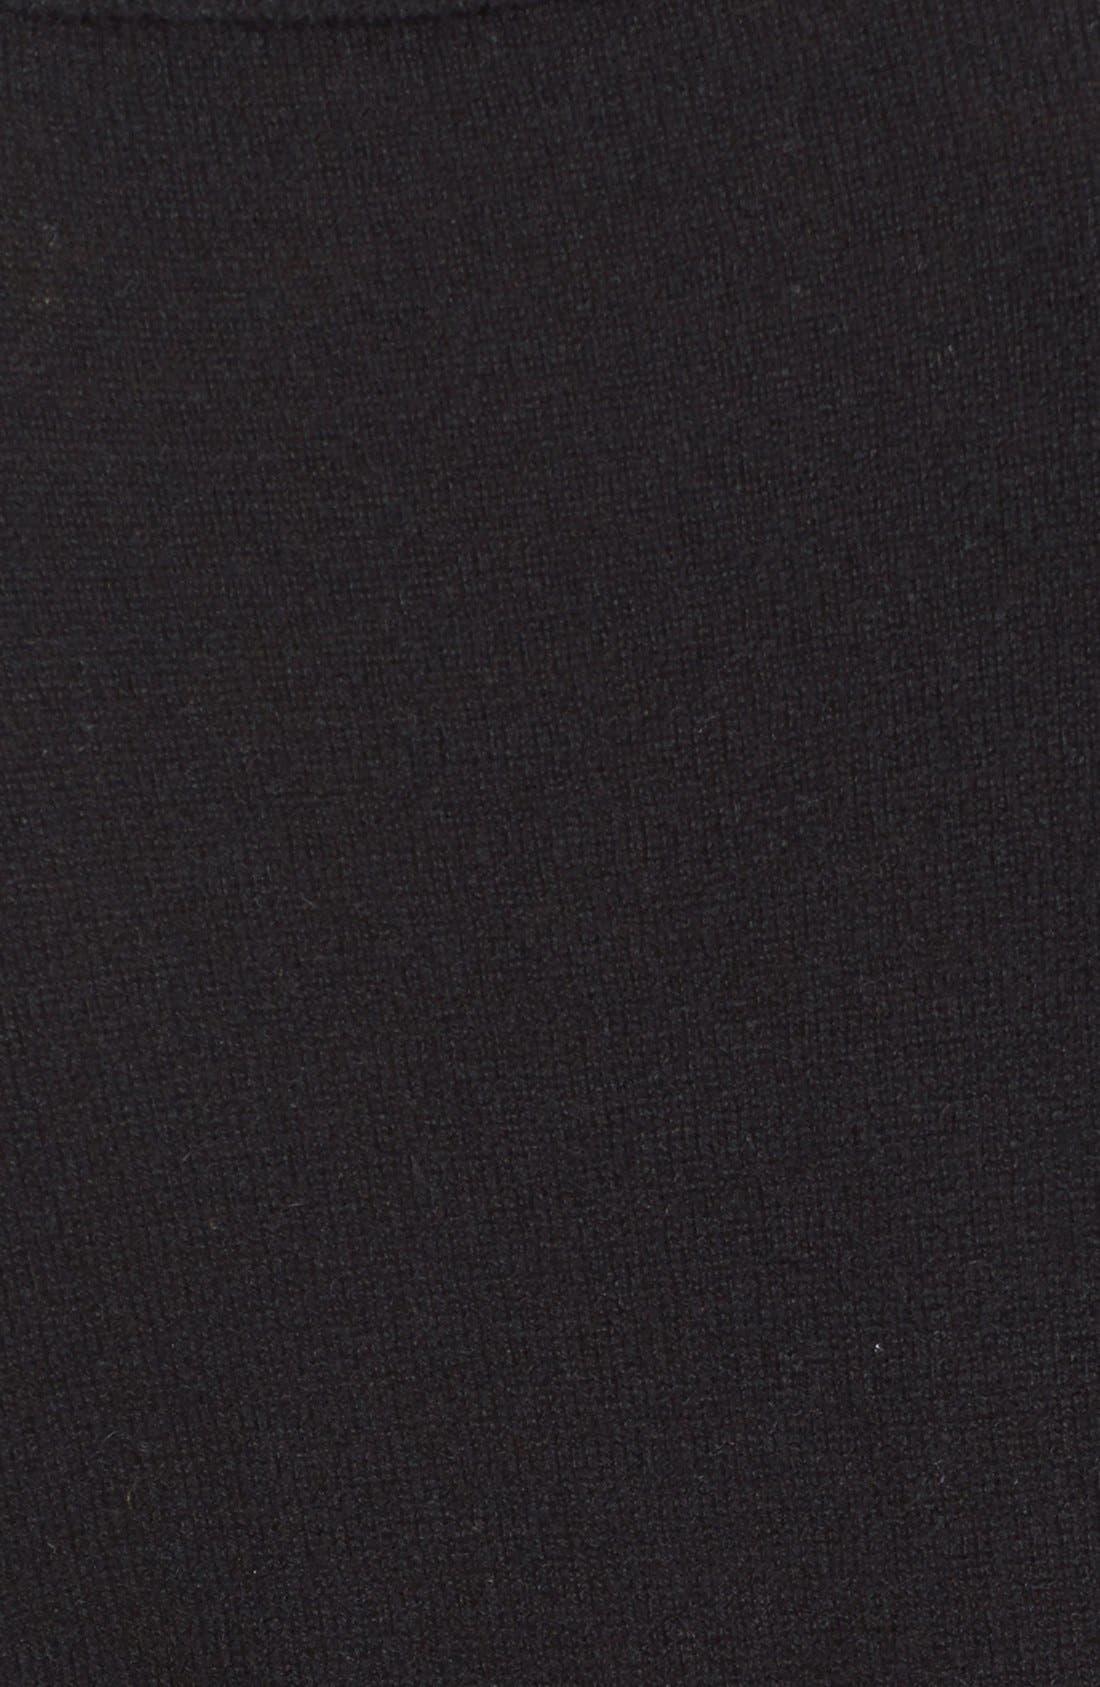 'Oscar' Turtleneck Sweater Dress,                             Alternate thumbnail 5, color,                             Black